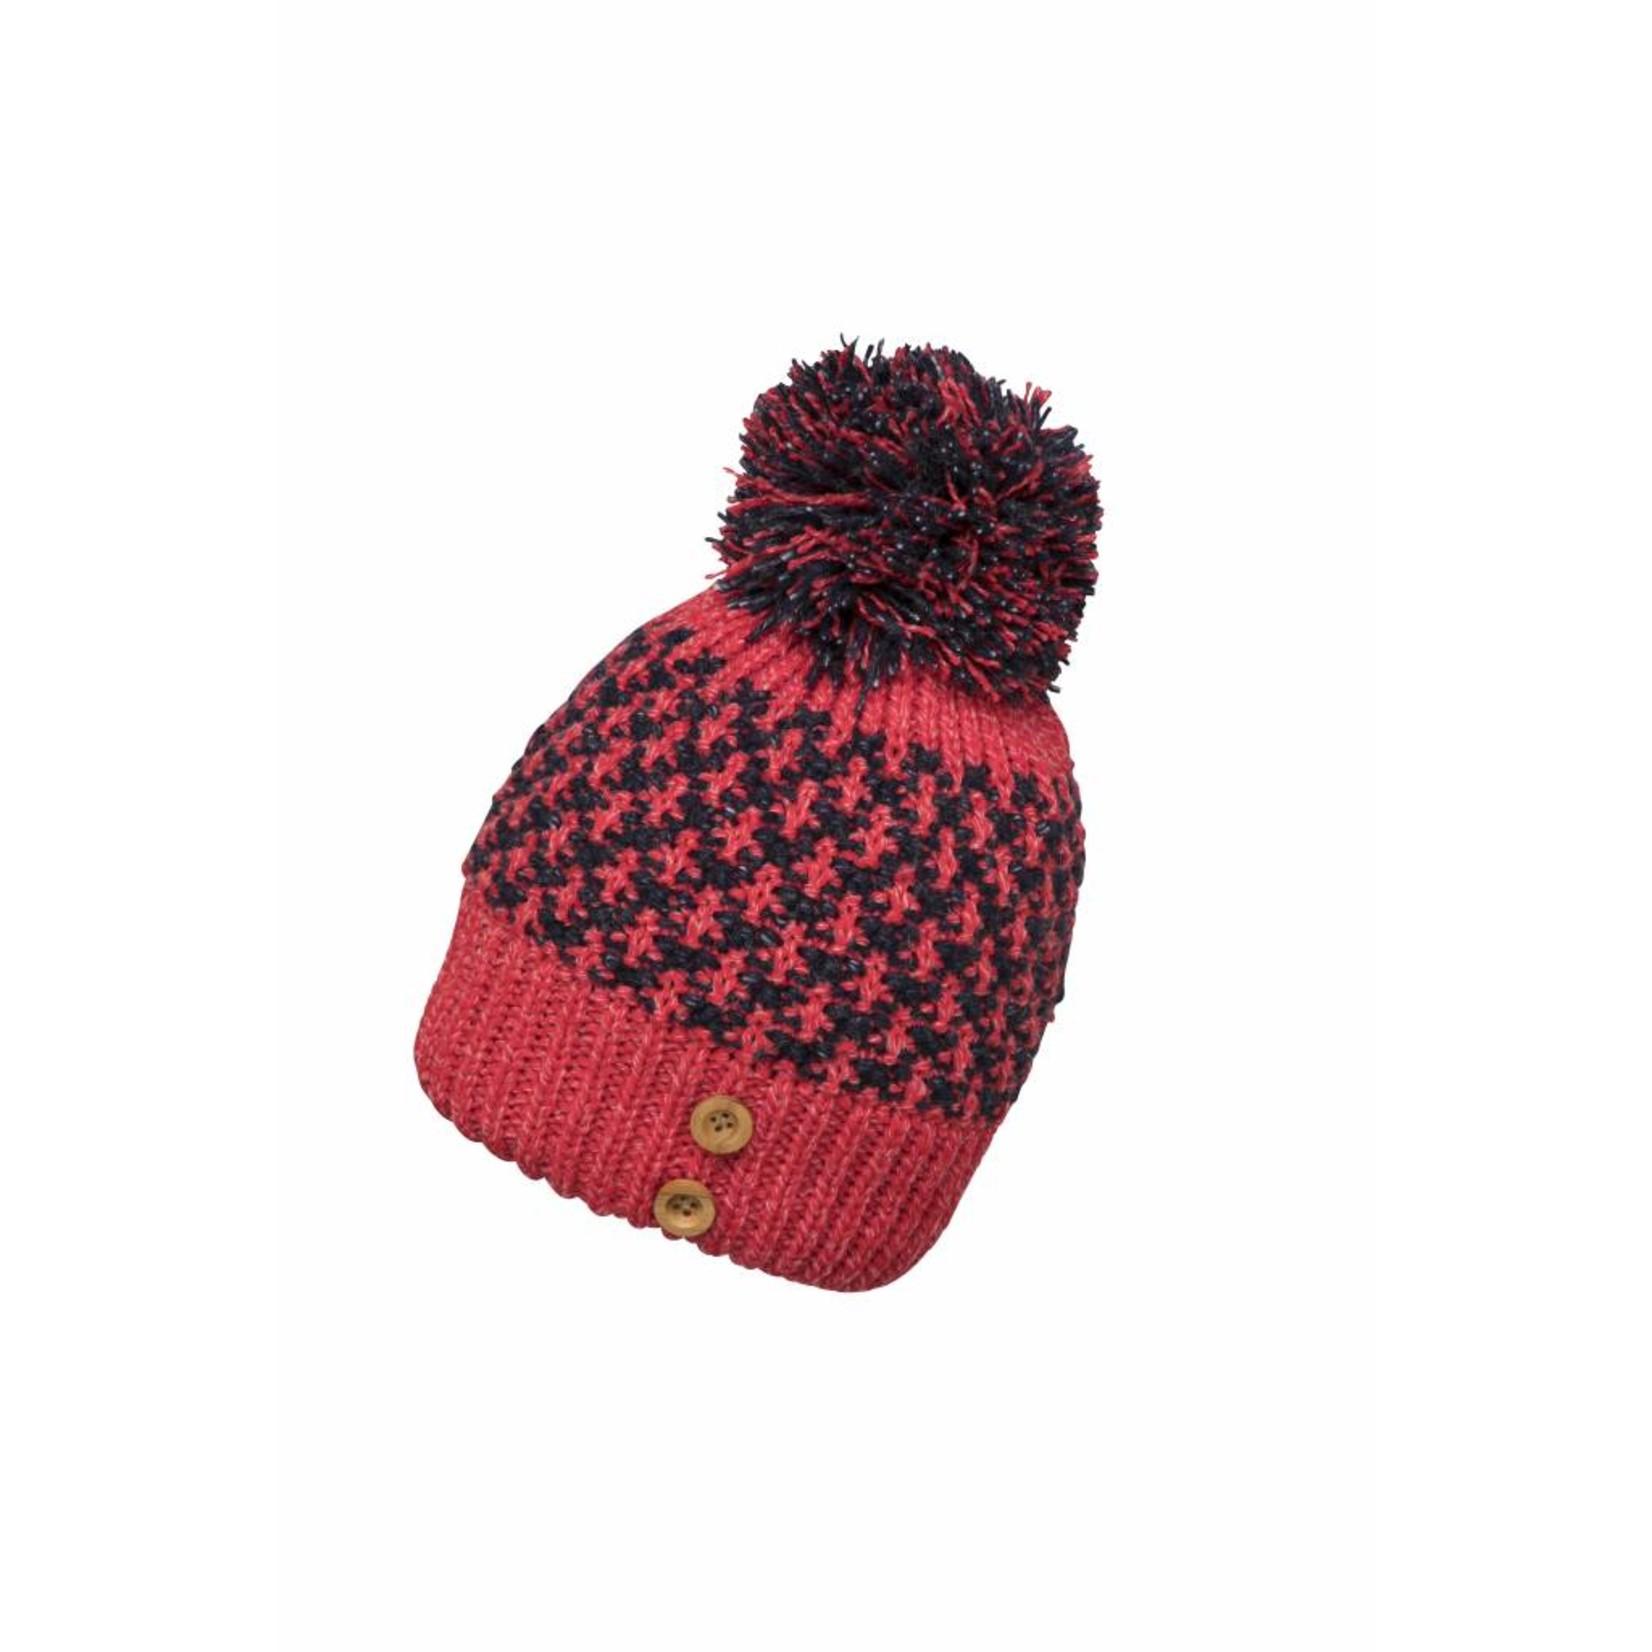 PHENIX  Amber Knit Hat with Pon-Pon